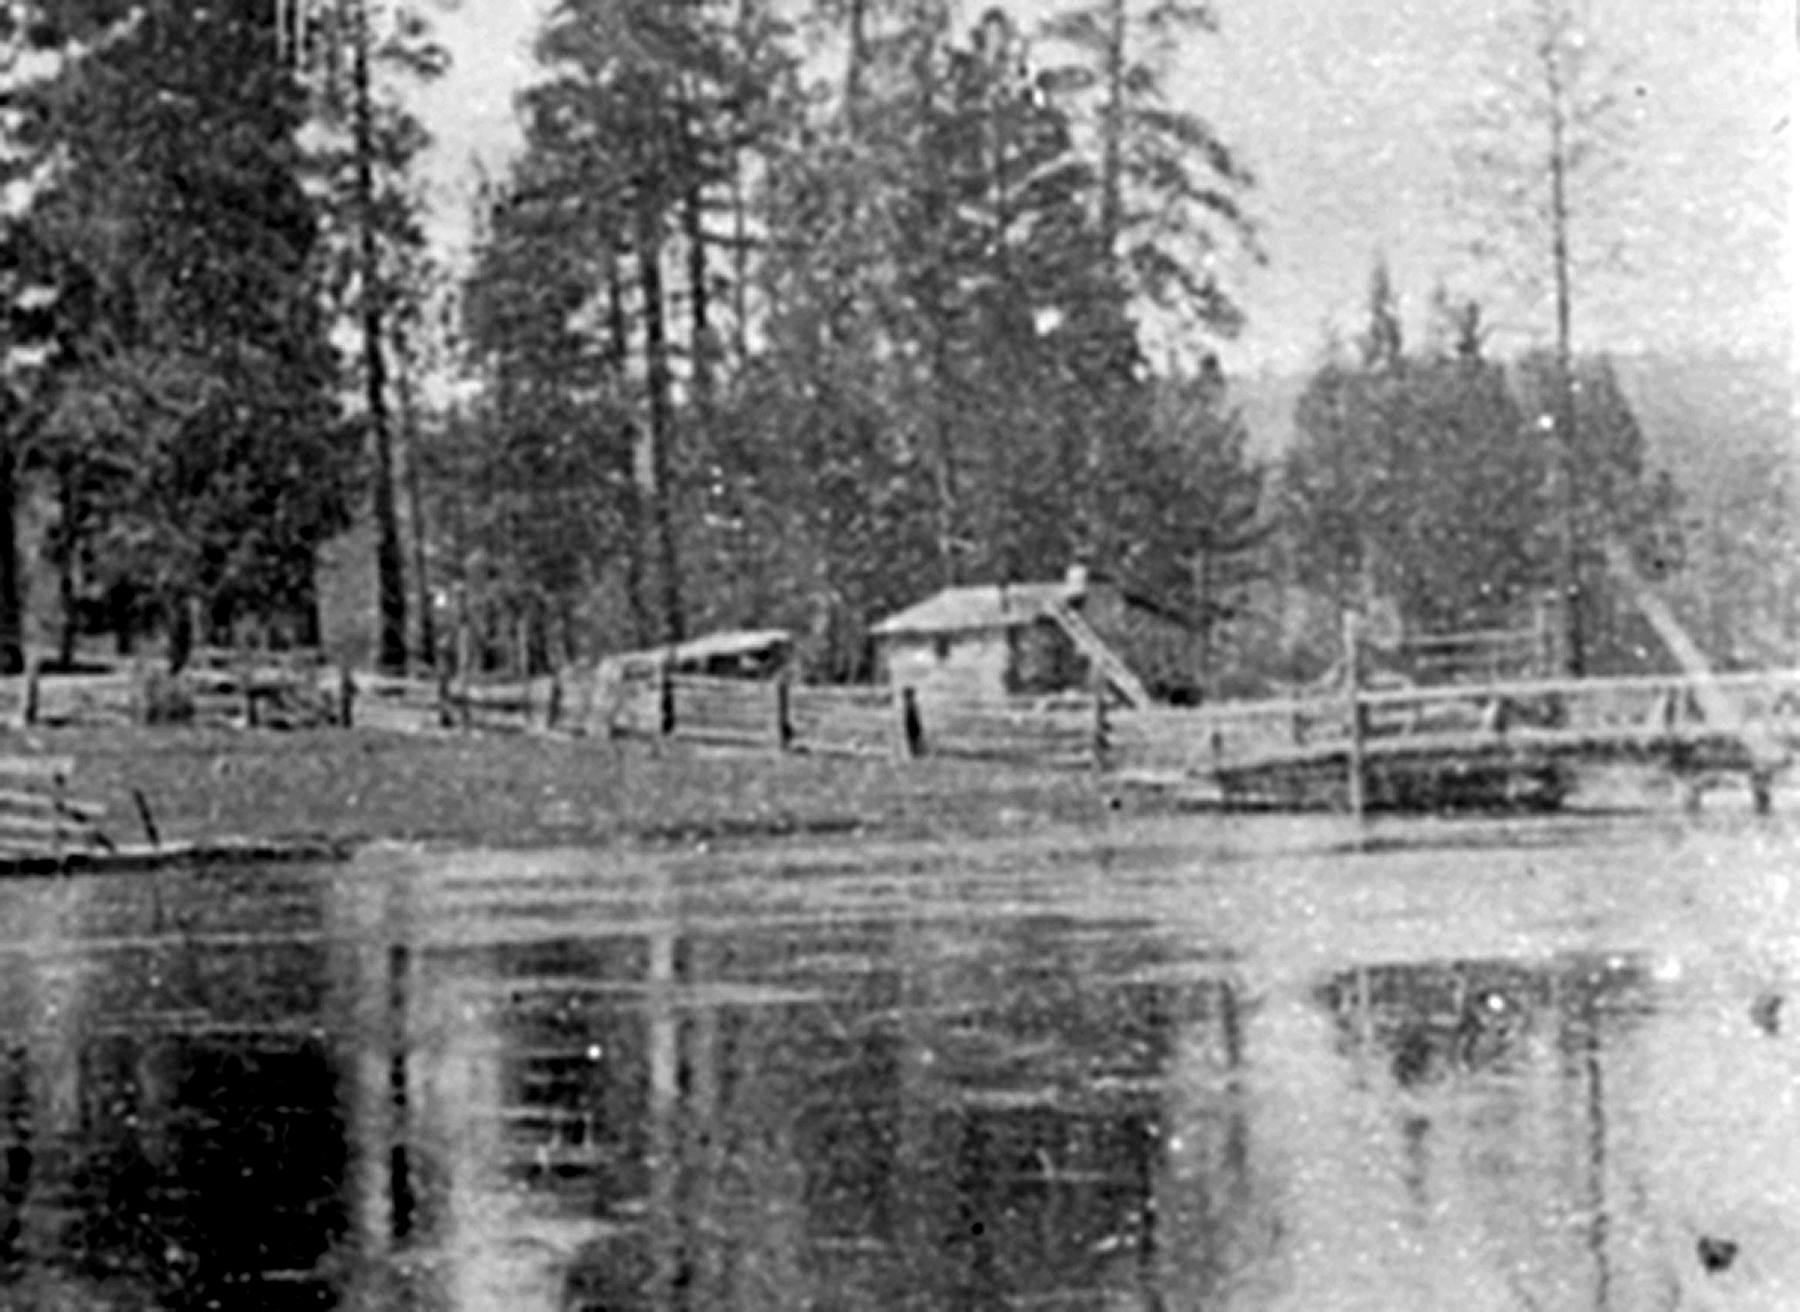 Early Bridge Across the Deschutes River at Farewell Bend